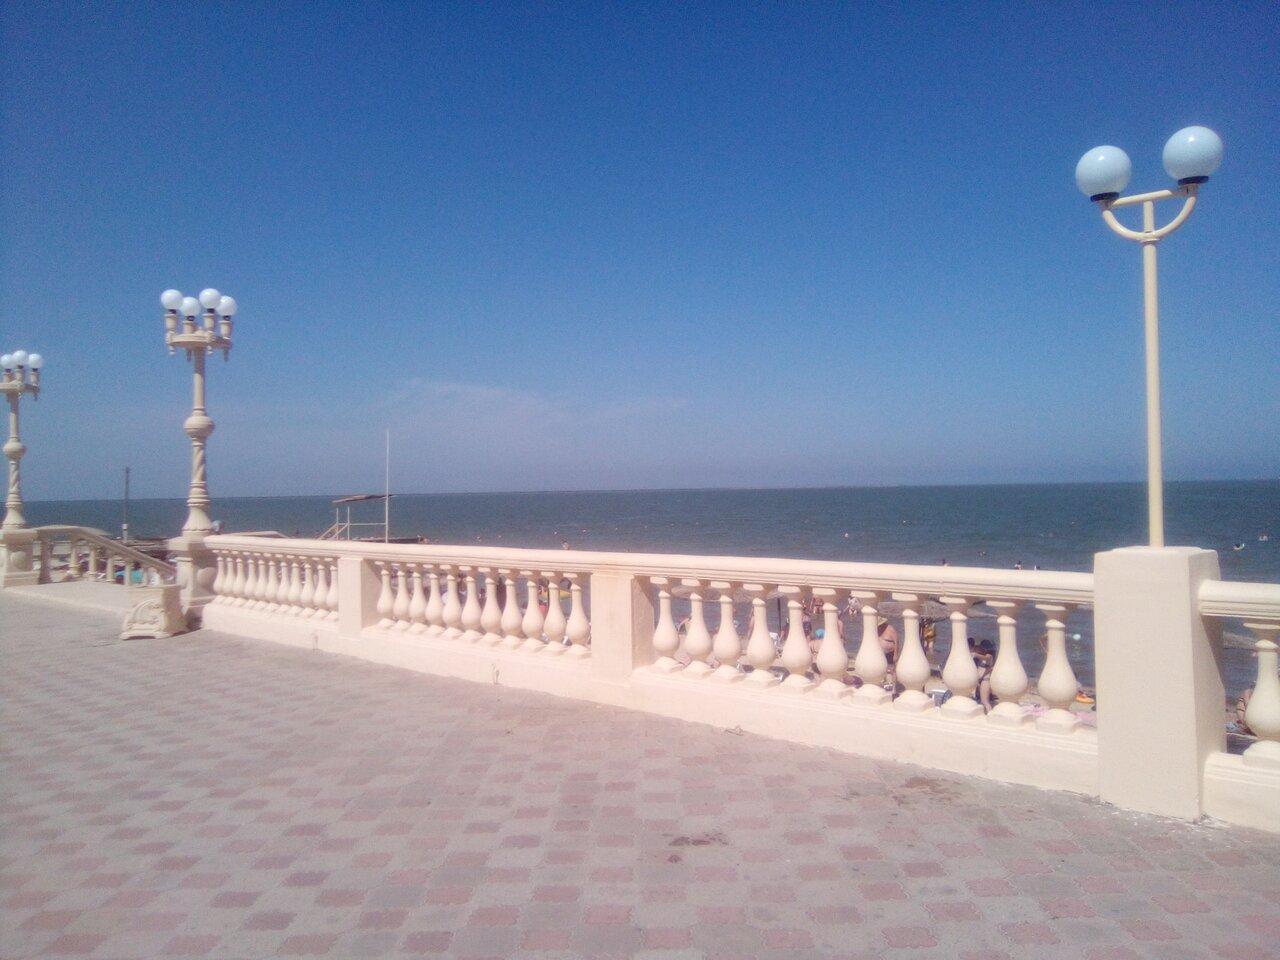 Город приморско ахтарск краснодарский край фото